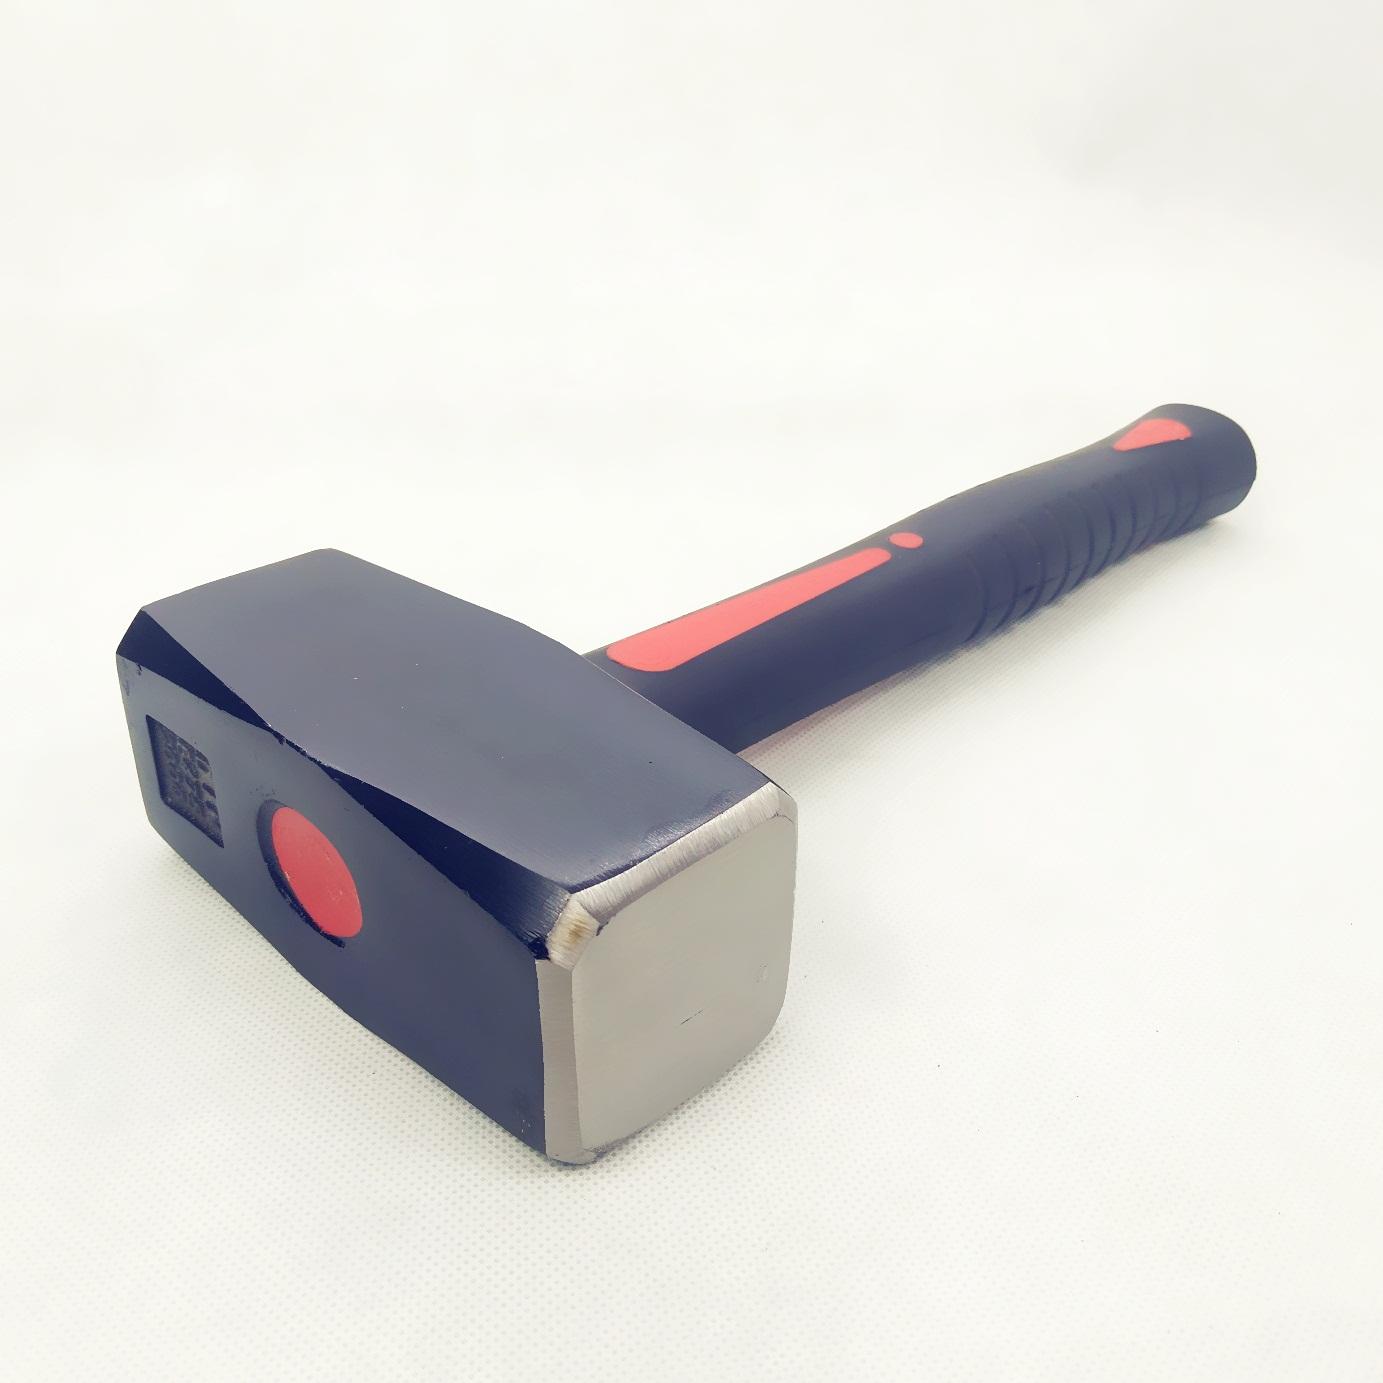 Steel Mason's Hammer Stoning Hammer with Plastic Handle (XL0065-2)